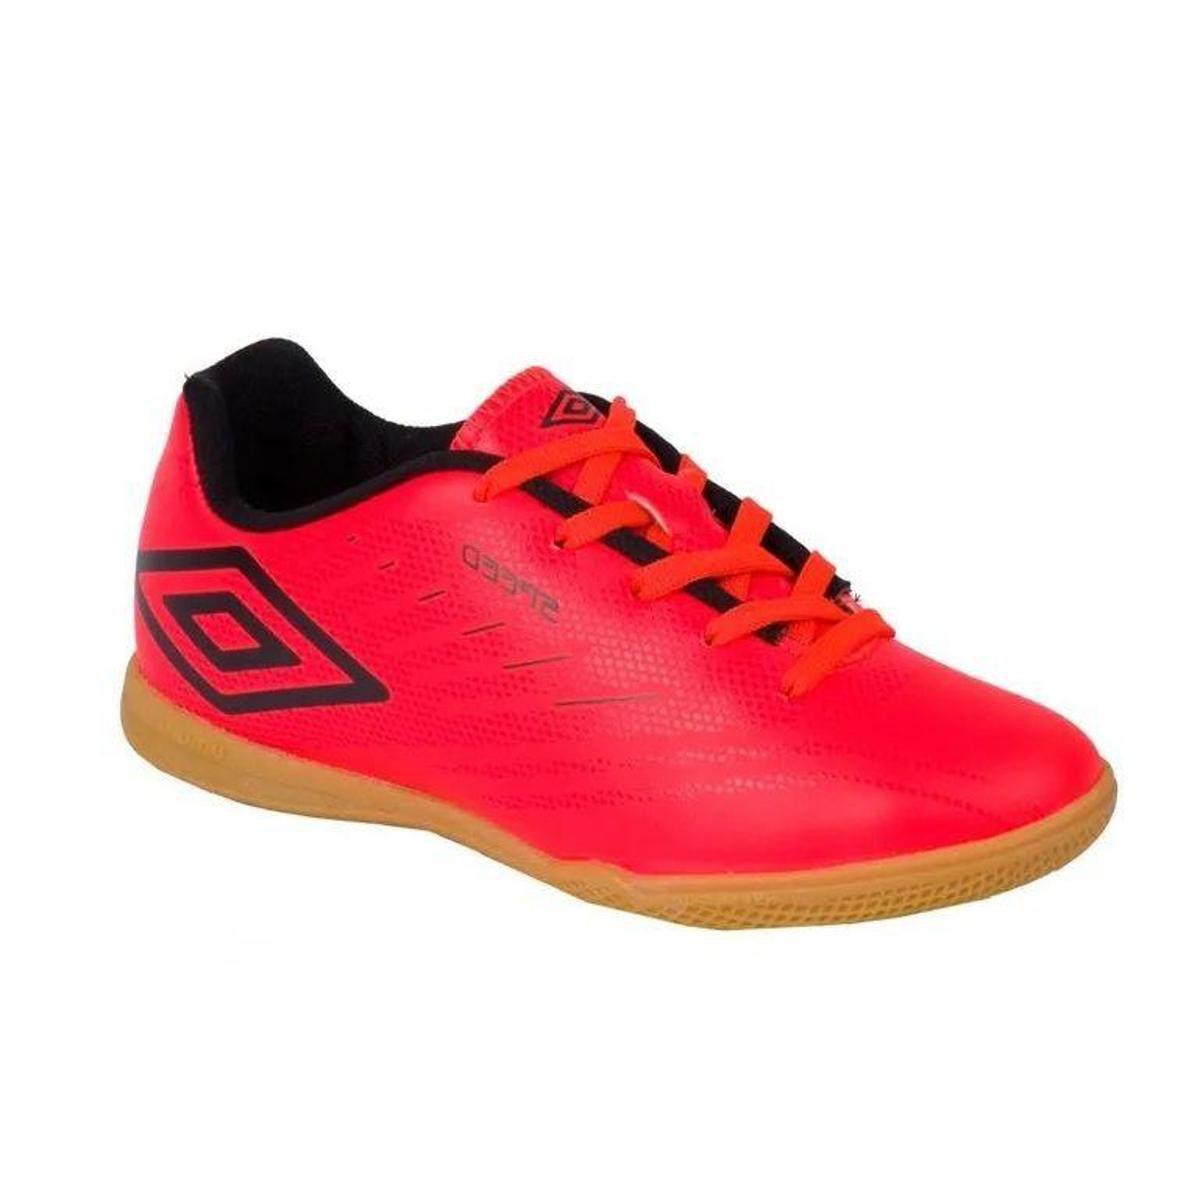 301c06ec13409 Tênis Umbro Speed IV JR Infantil Chuteira Futsal 0F82053 - Compre Agora